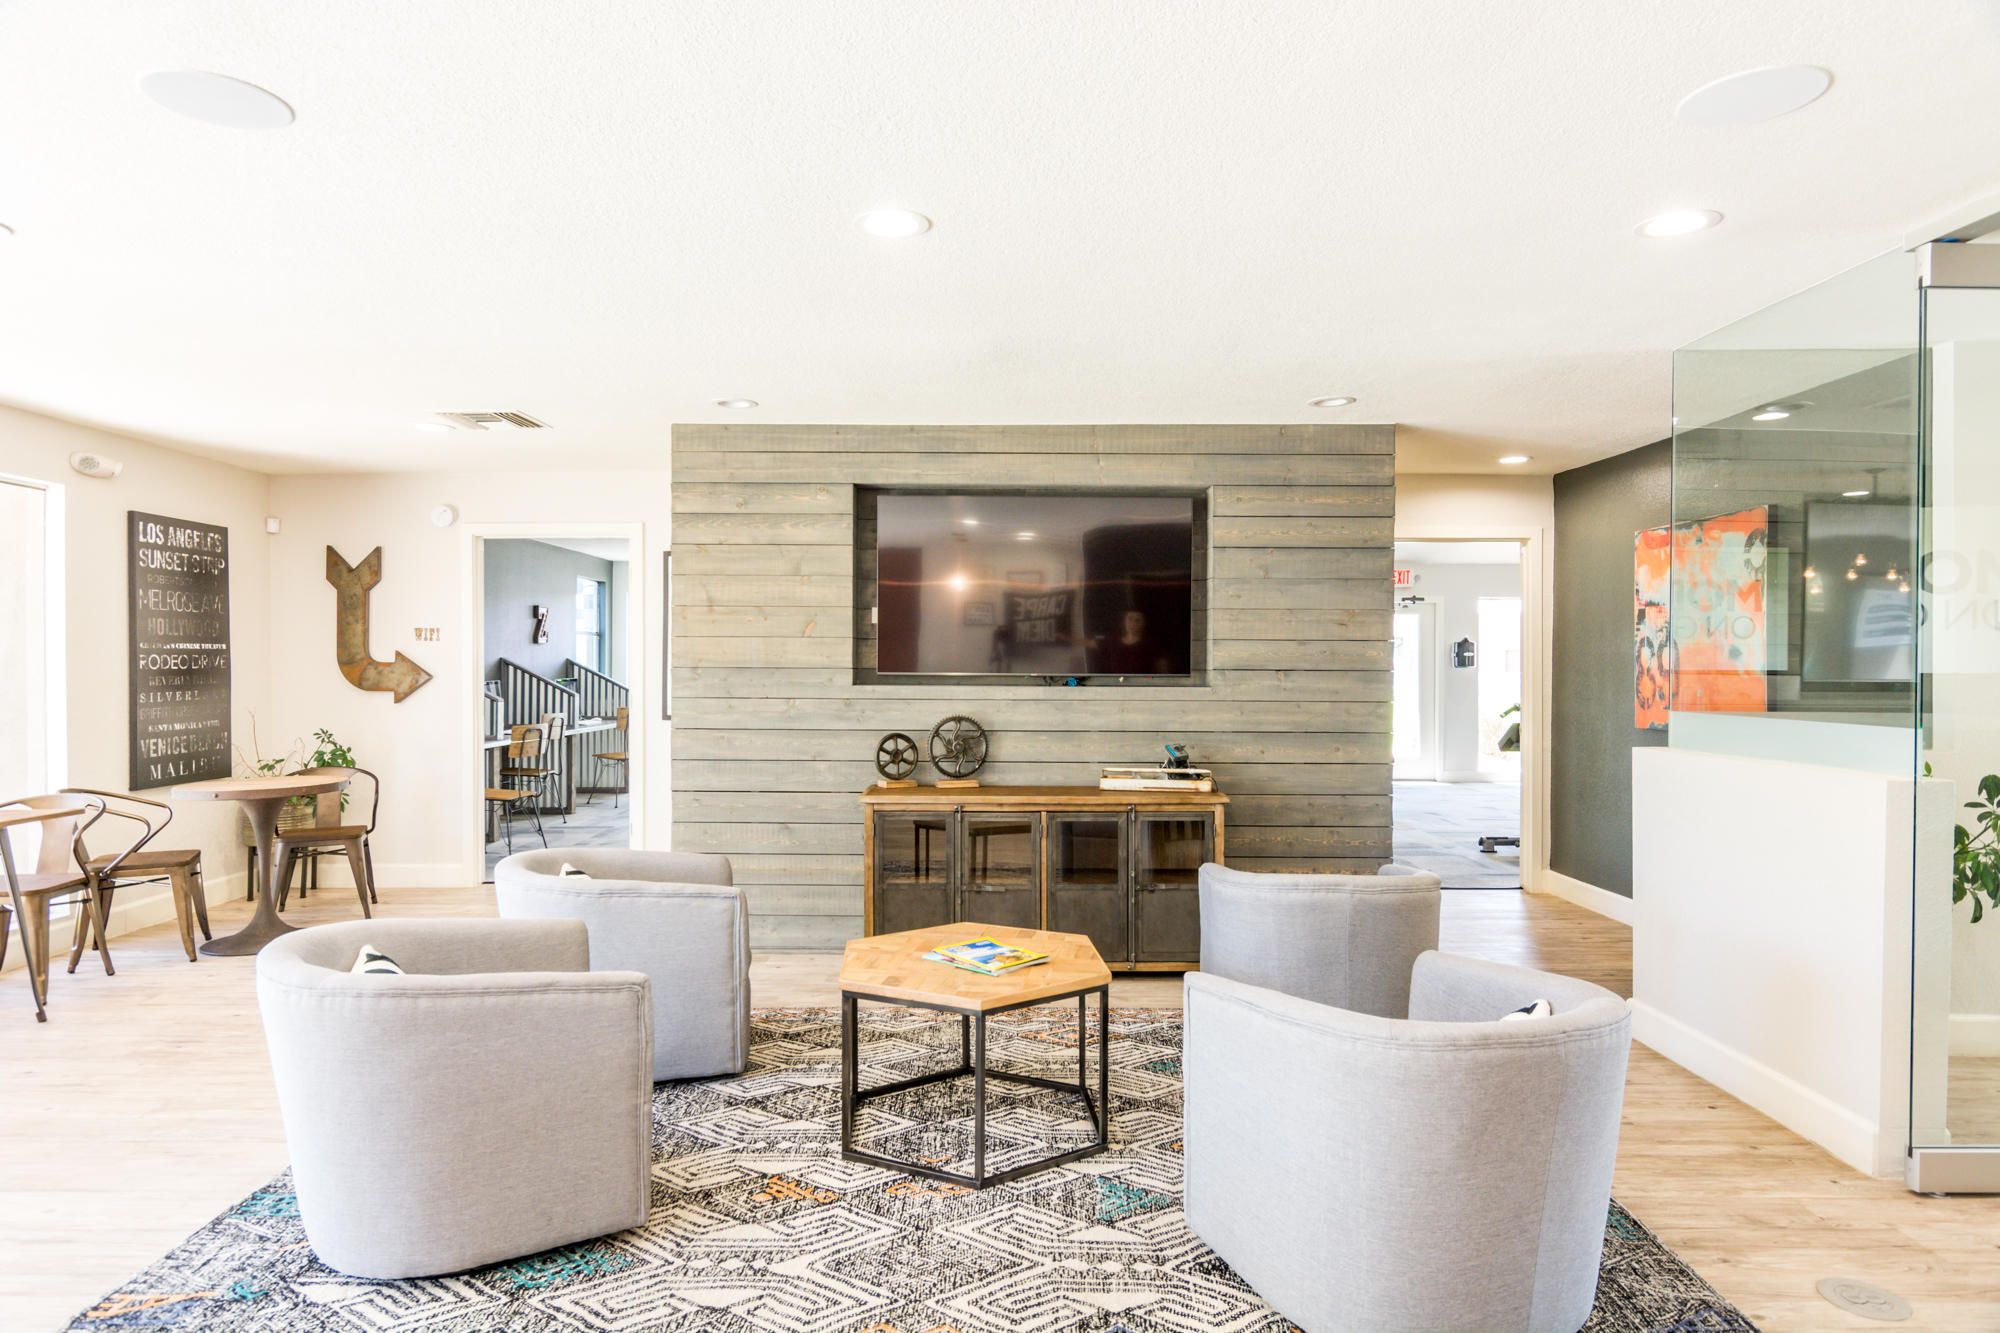 Delano Apartment Homes image 4